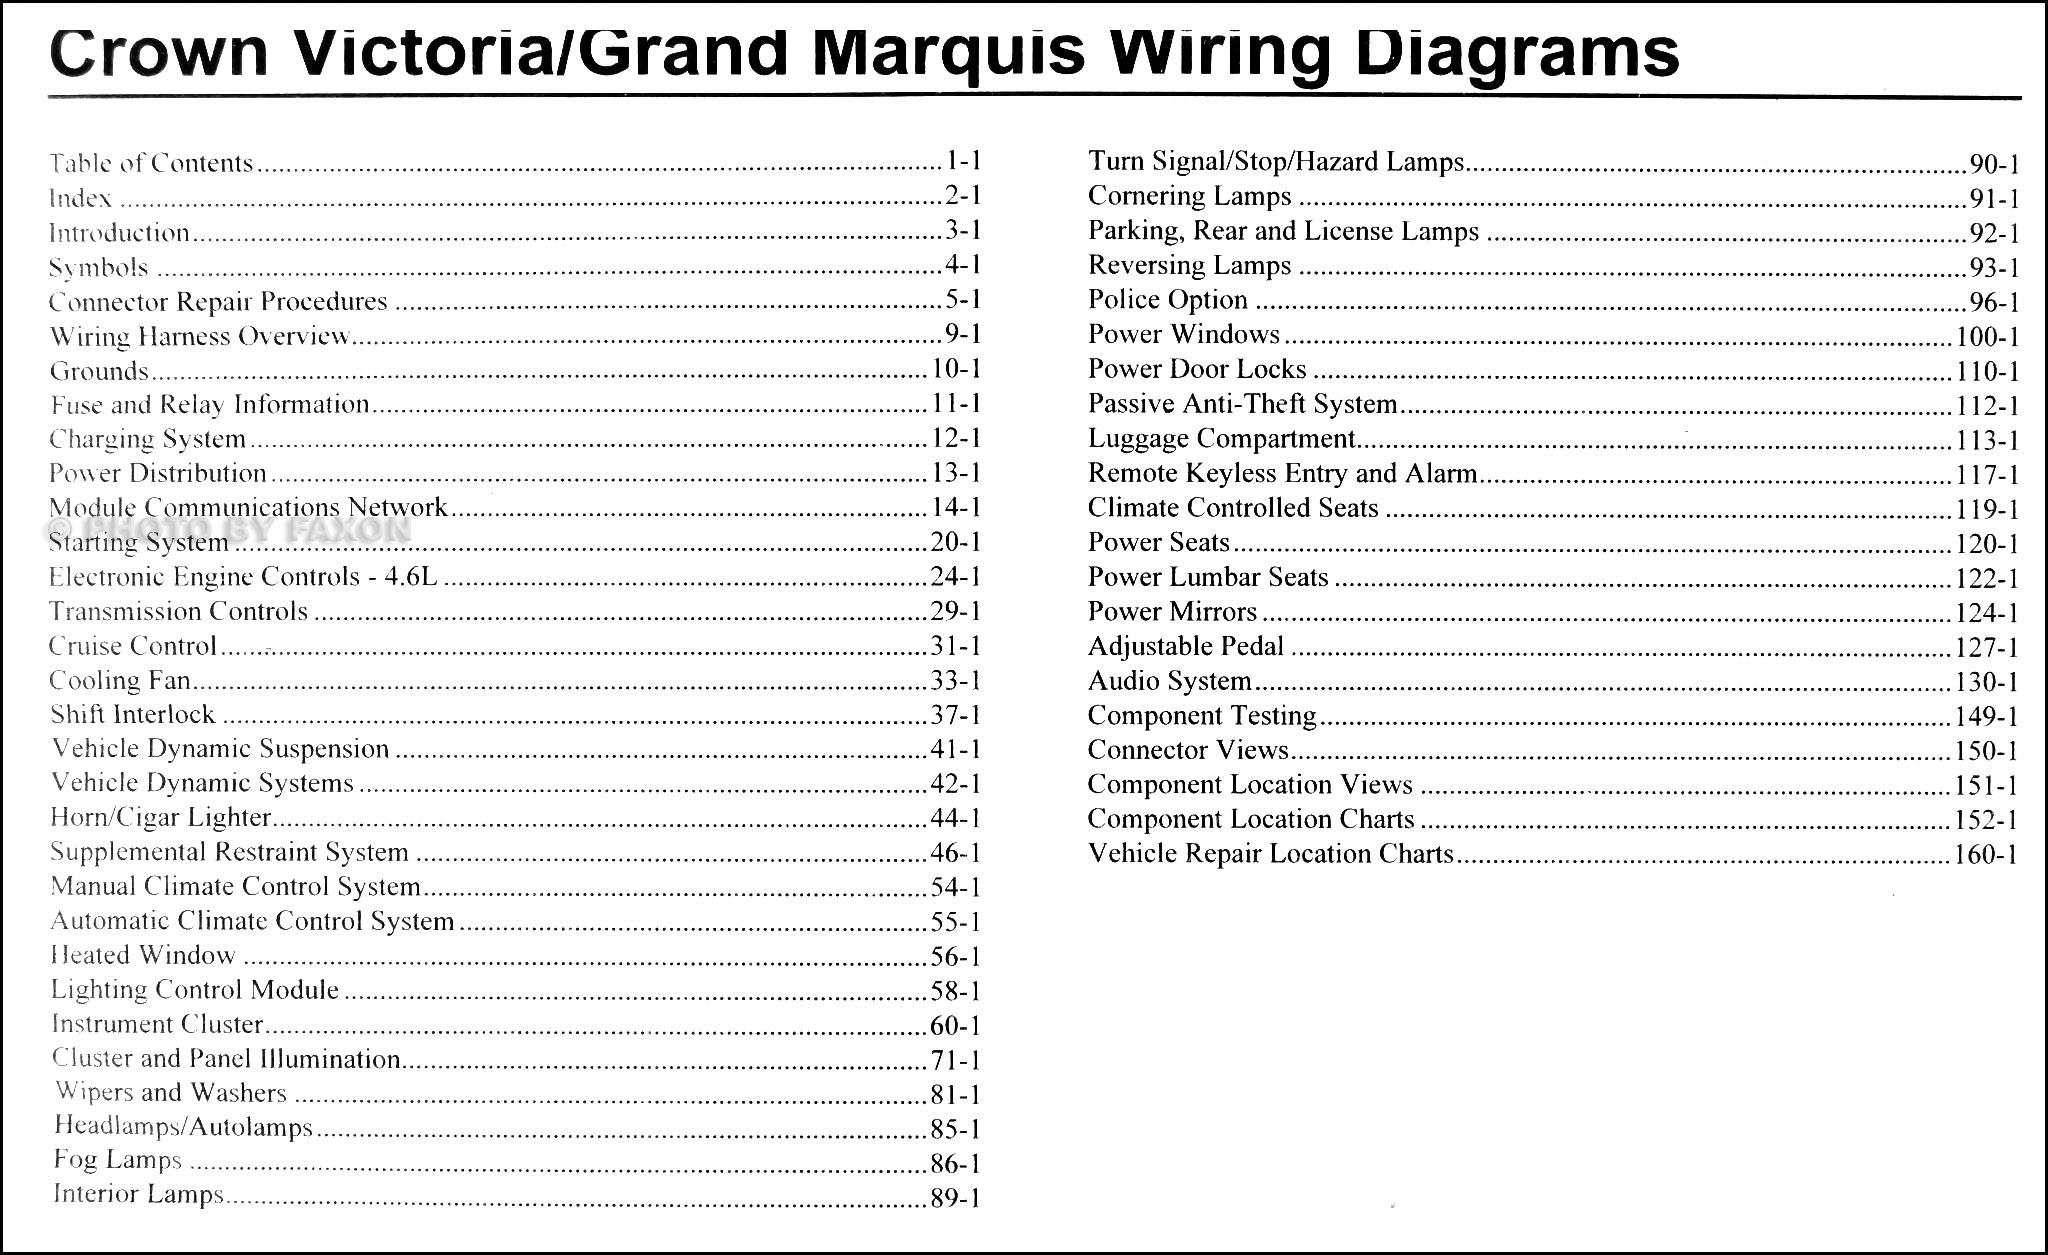 Diagram 2009 Crown Victoria Grand Marquis Original Wiring Diagram Full Version Hd Quality Wiring Diagram Circutdiagram Gtve It